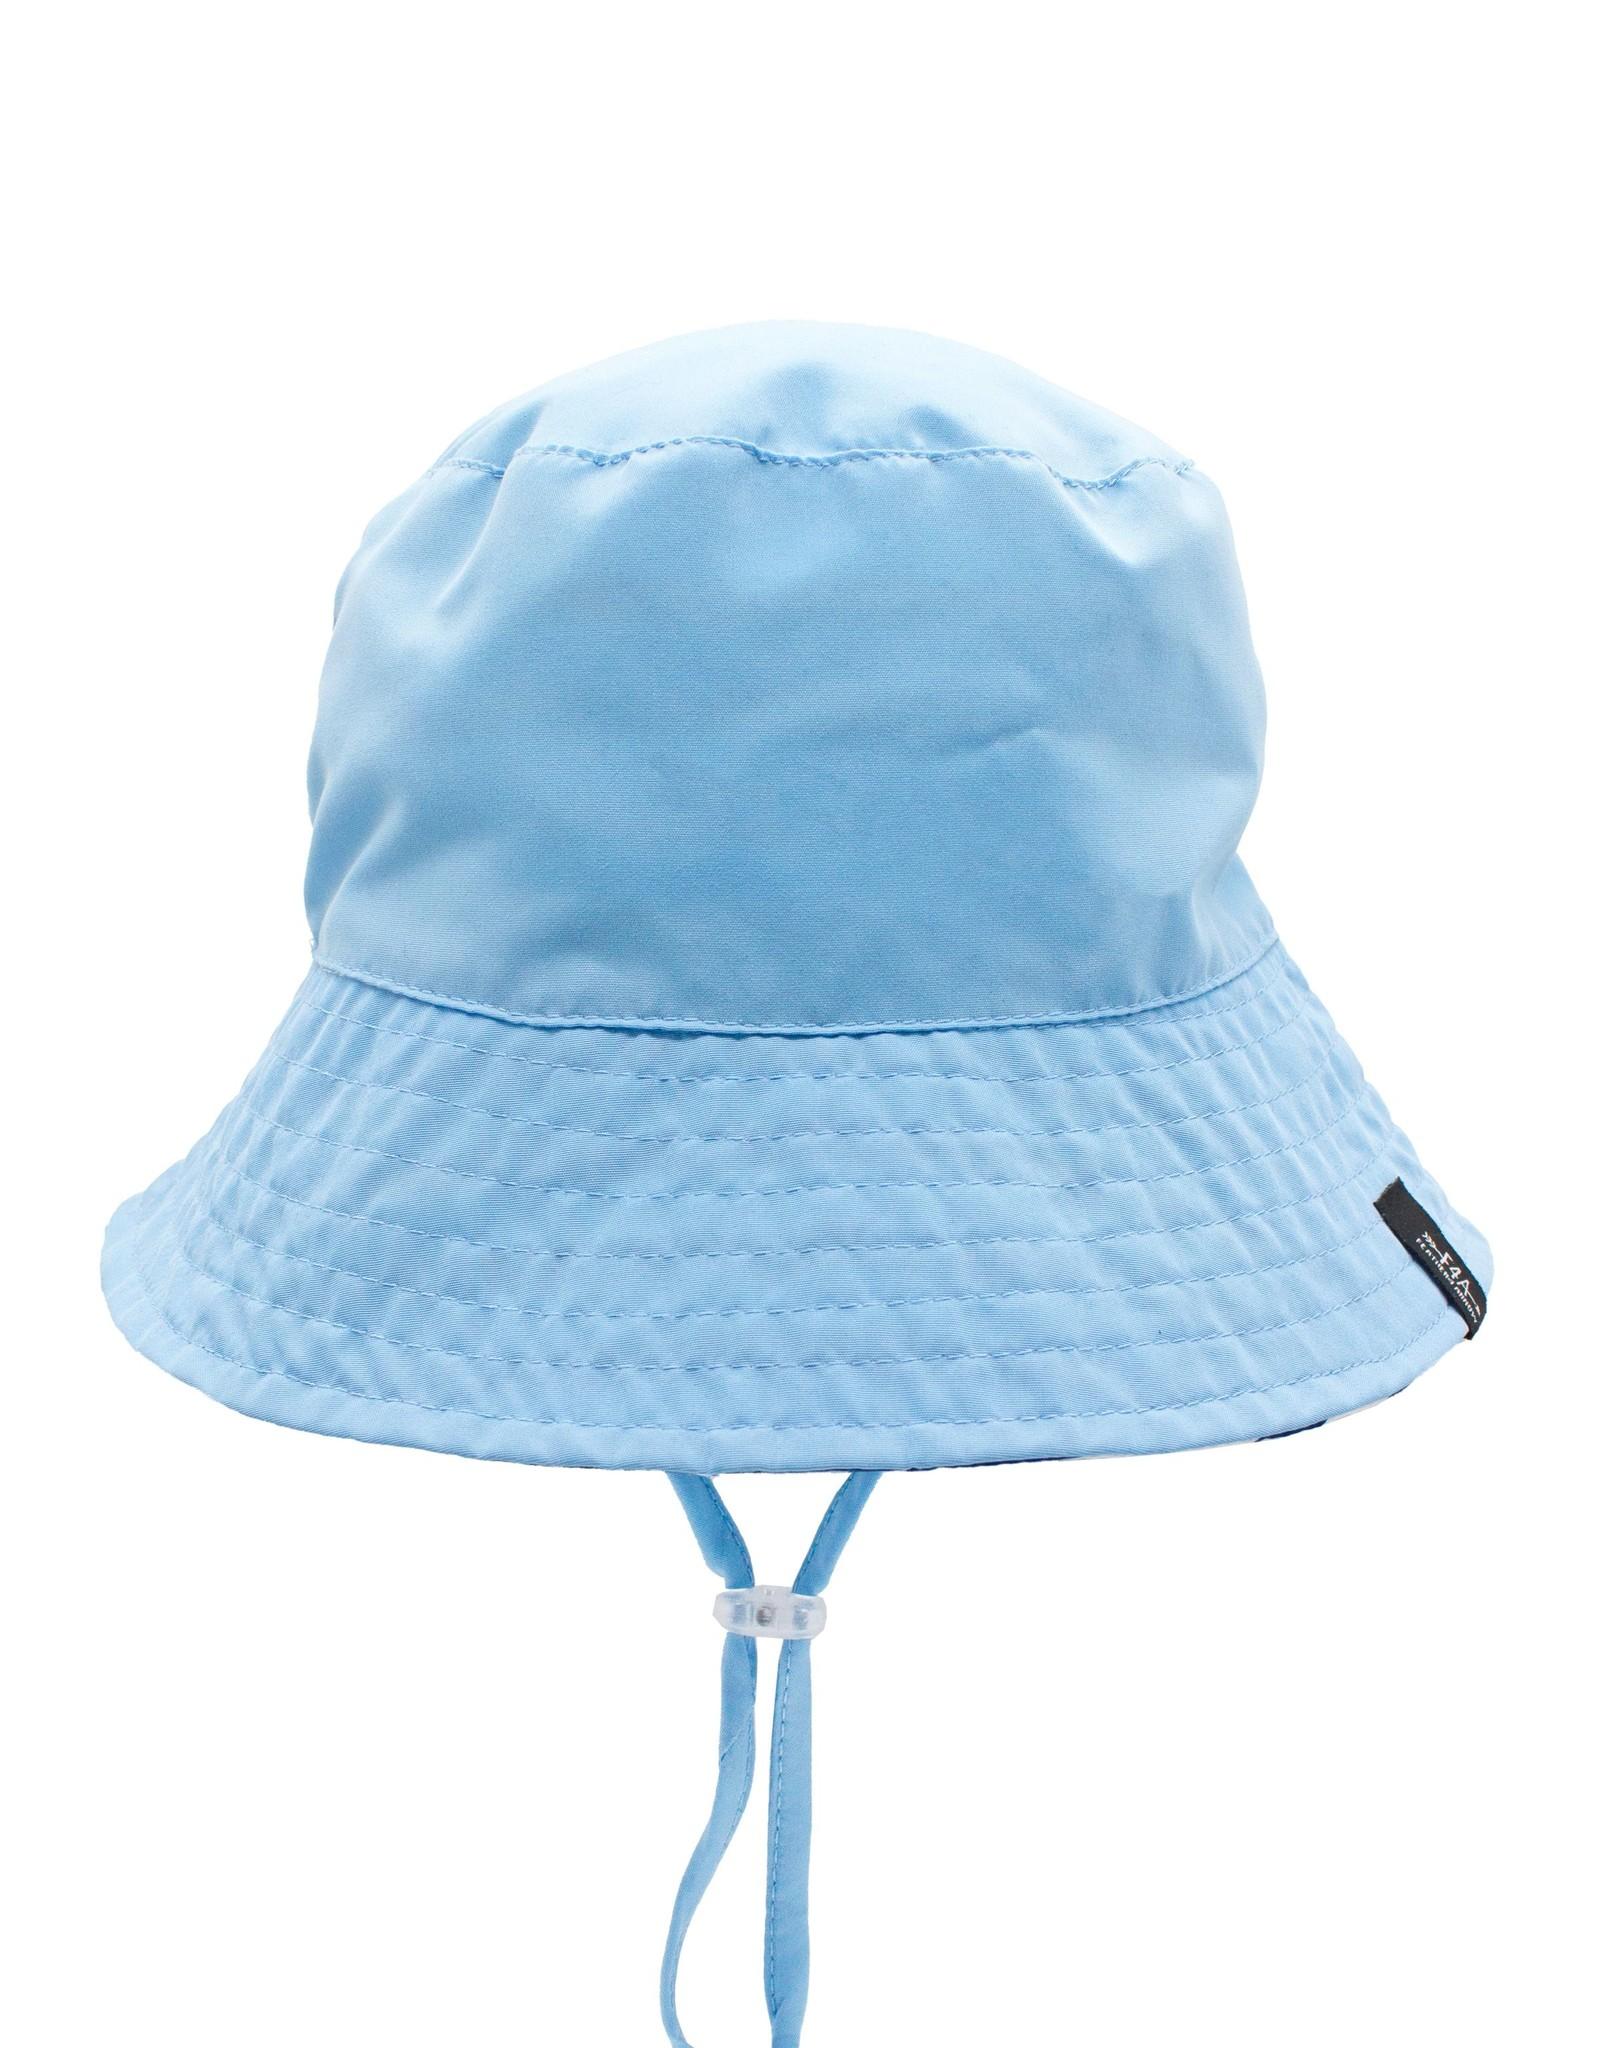 Feather 4 Arrow reversible bucket hat- blue